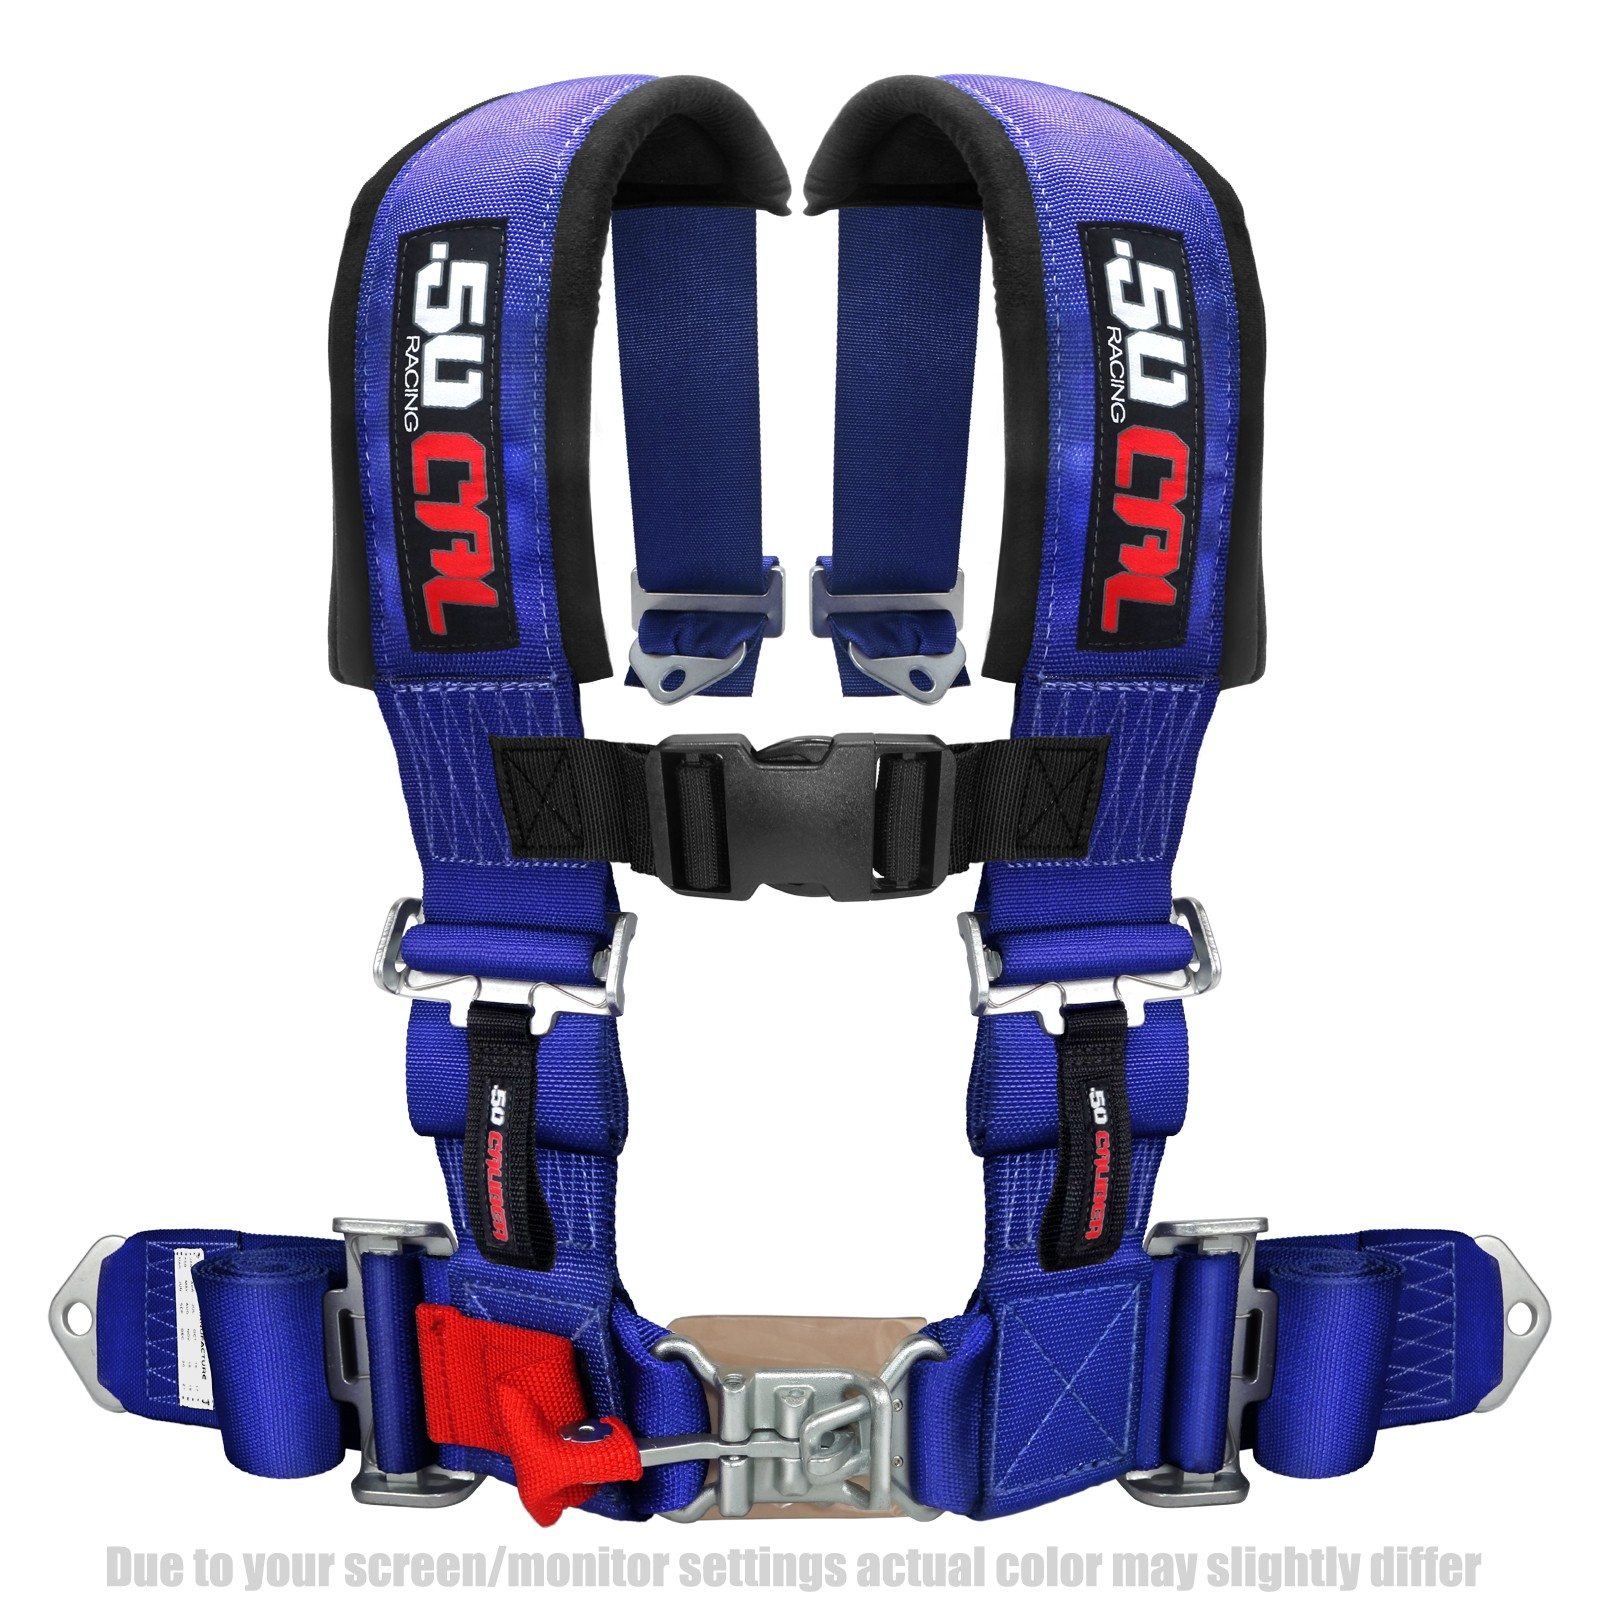 50 Caliber Racing 3 4 Point Safety Harness Seat Belts. Blue 3 4 Point Harness Seat Belt 50 Caliber Racing. Seat. Seat Belt Harness Zipper At Scoala.co